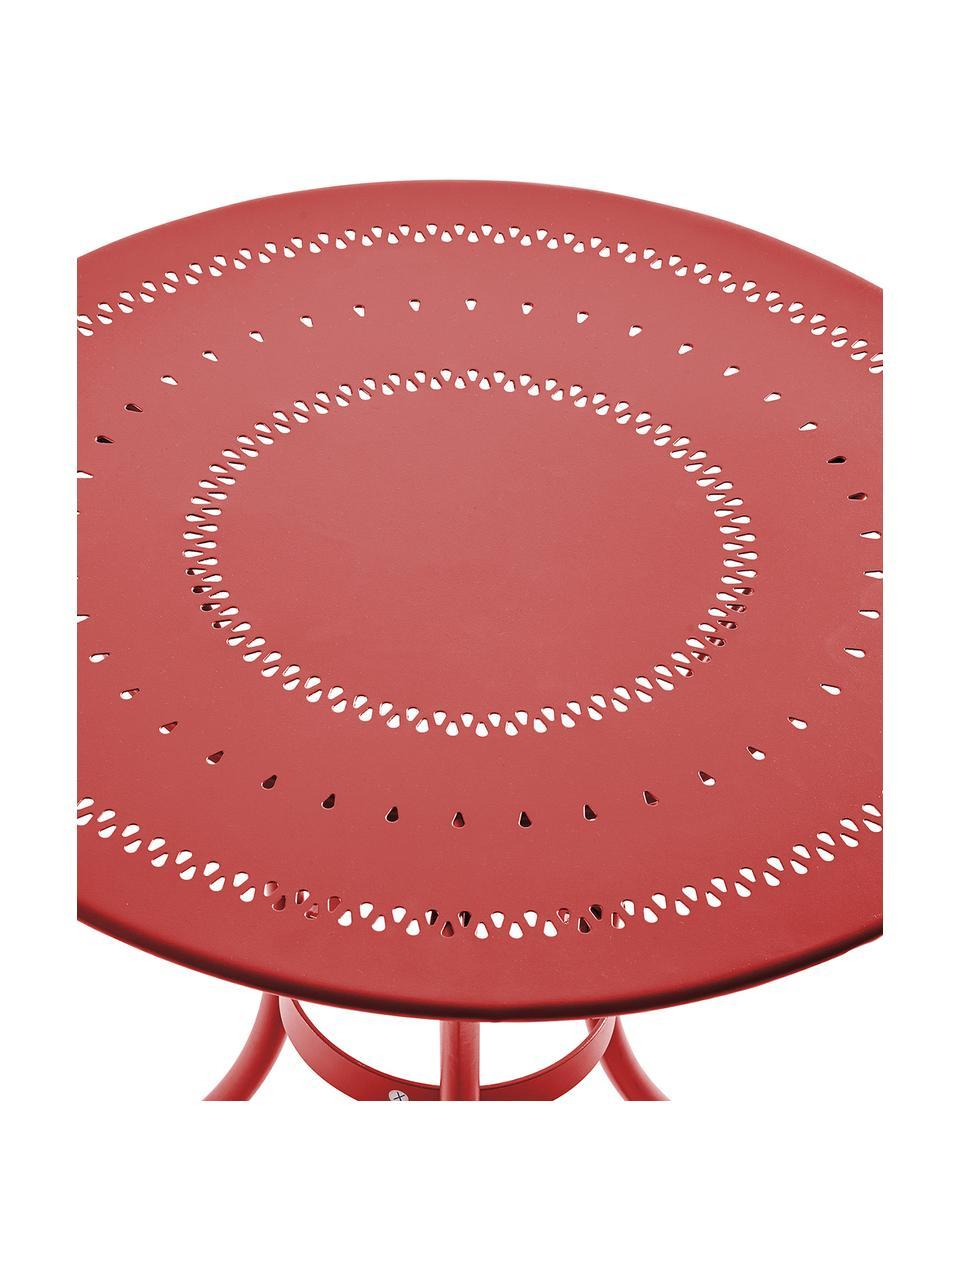 Garten-Bistrotisch Century aus Metall, Metall, pulverbeschichtet, Rot, Ø 58 x H 71 cm